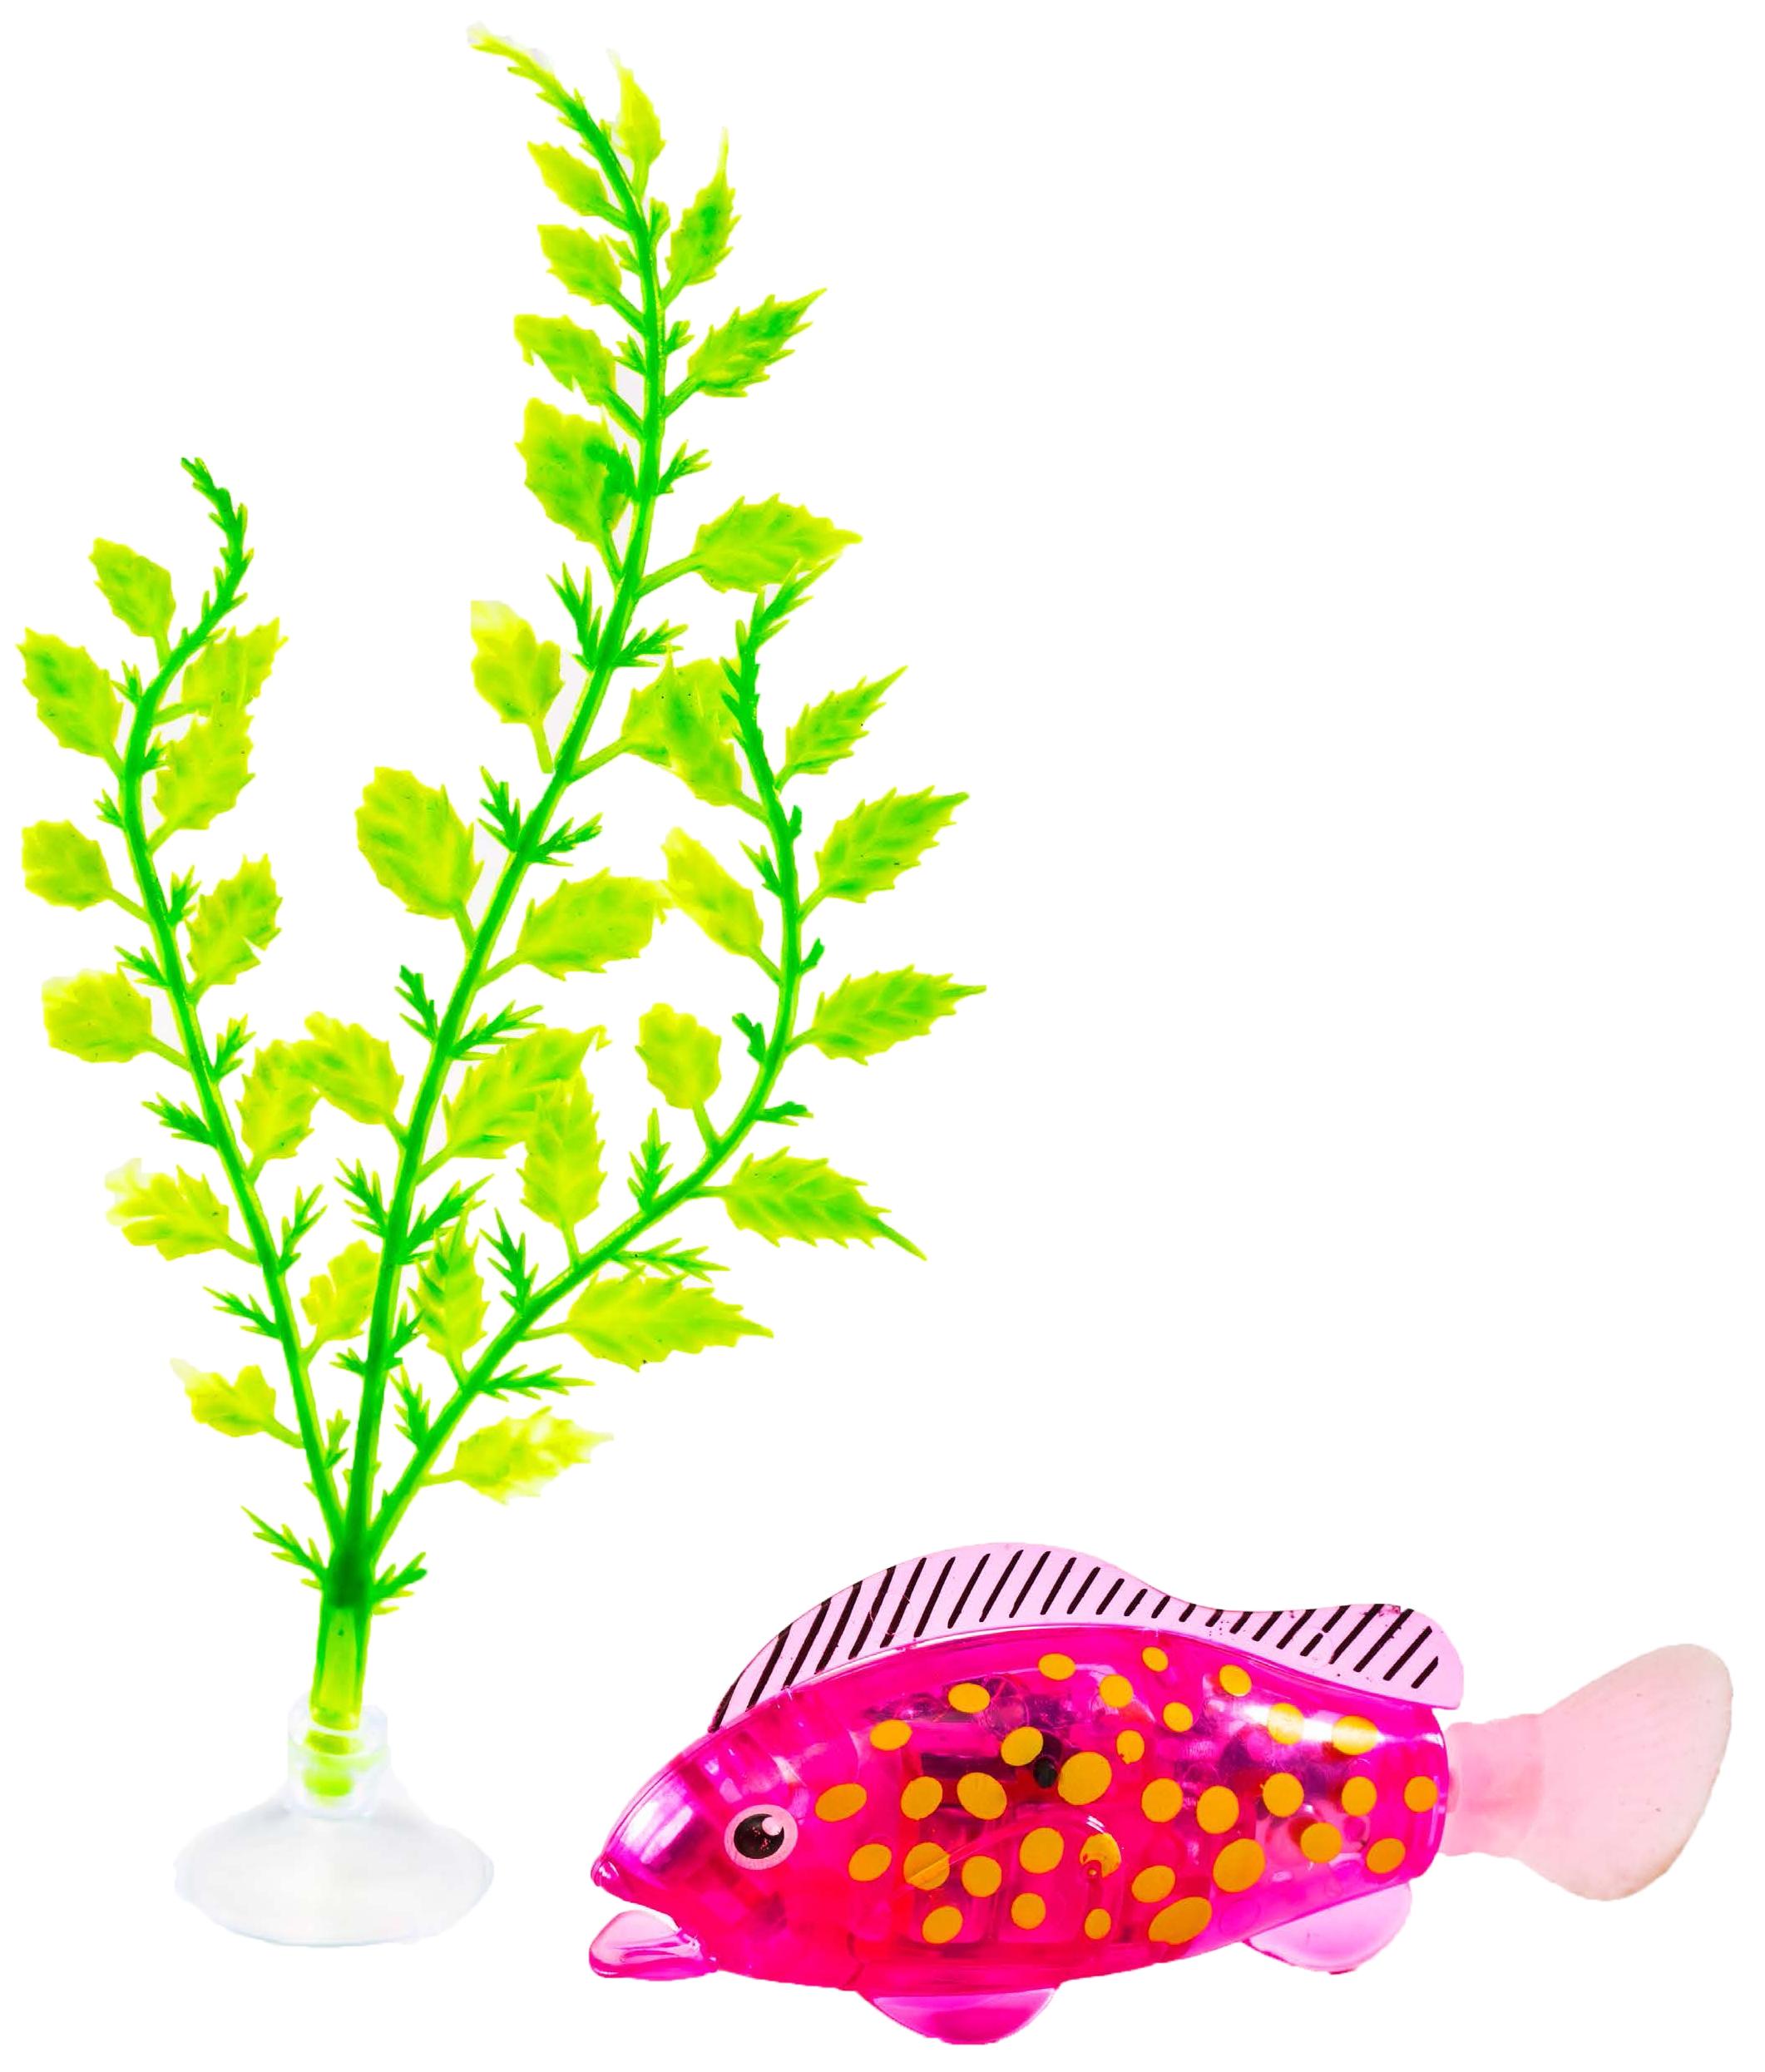 Интерактивные животные z-fish Рыбка плавающая с аксессуарами shanny vinyl custom photography backdrops prop graffiti&wall theme digital printed photo studio background graffiti jty 01 page 9